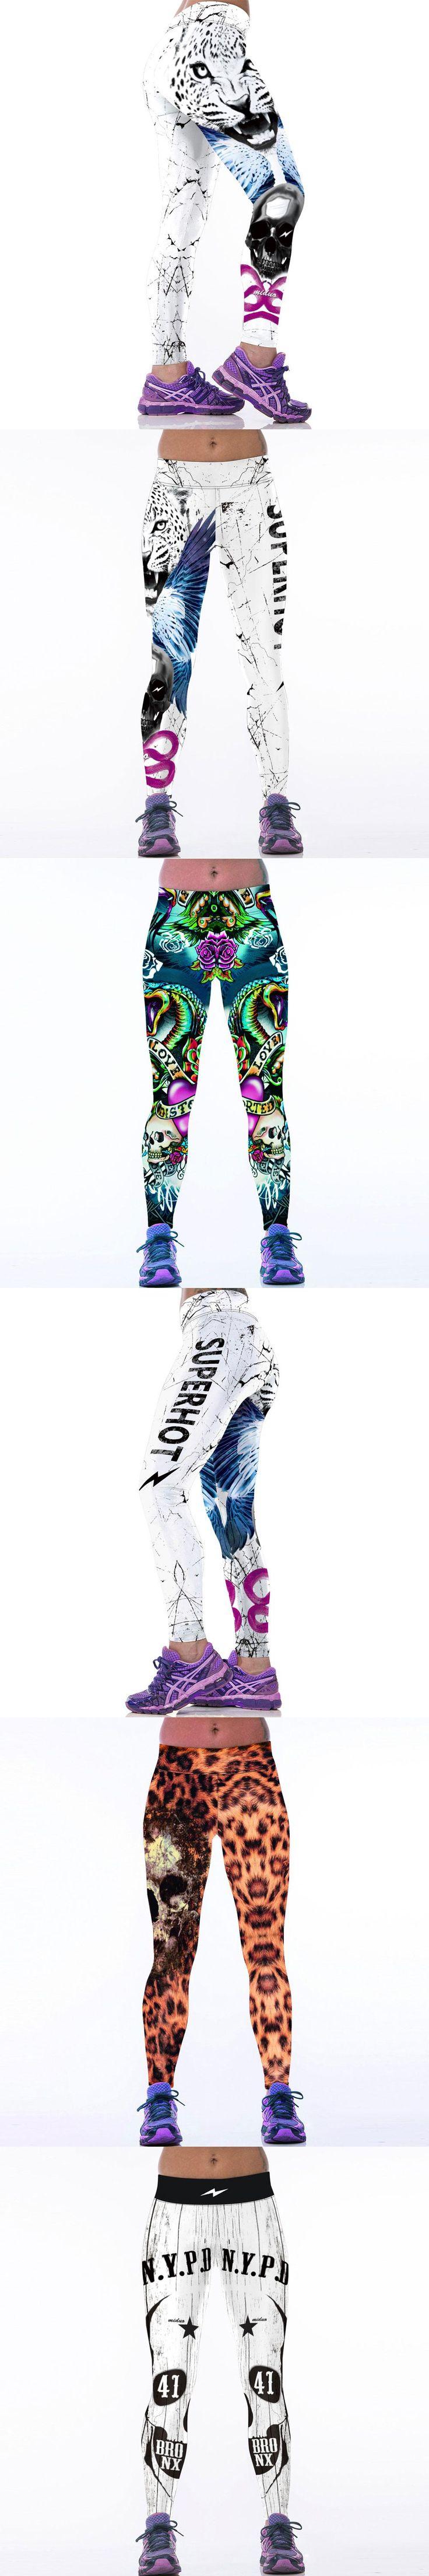 Hot Women Sporting Leggings 3D Printed Fitness Legins Workout Legging Bodybuilding Pants Jeggings Leggins Ropa Deportiva Mujer